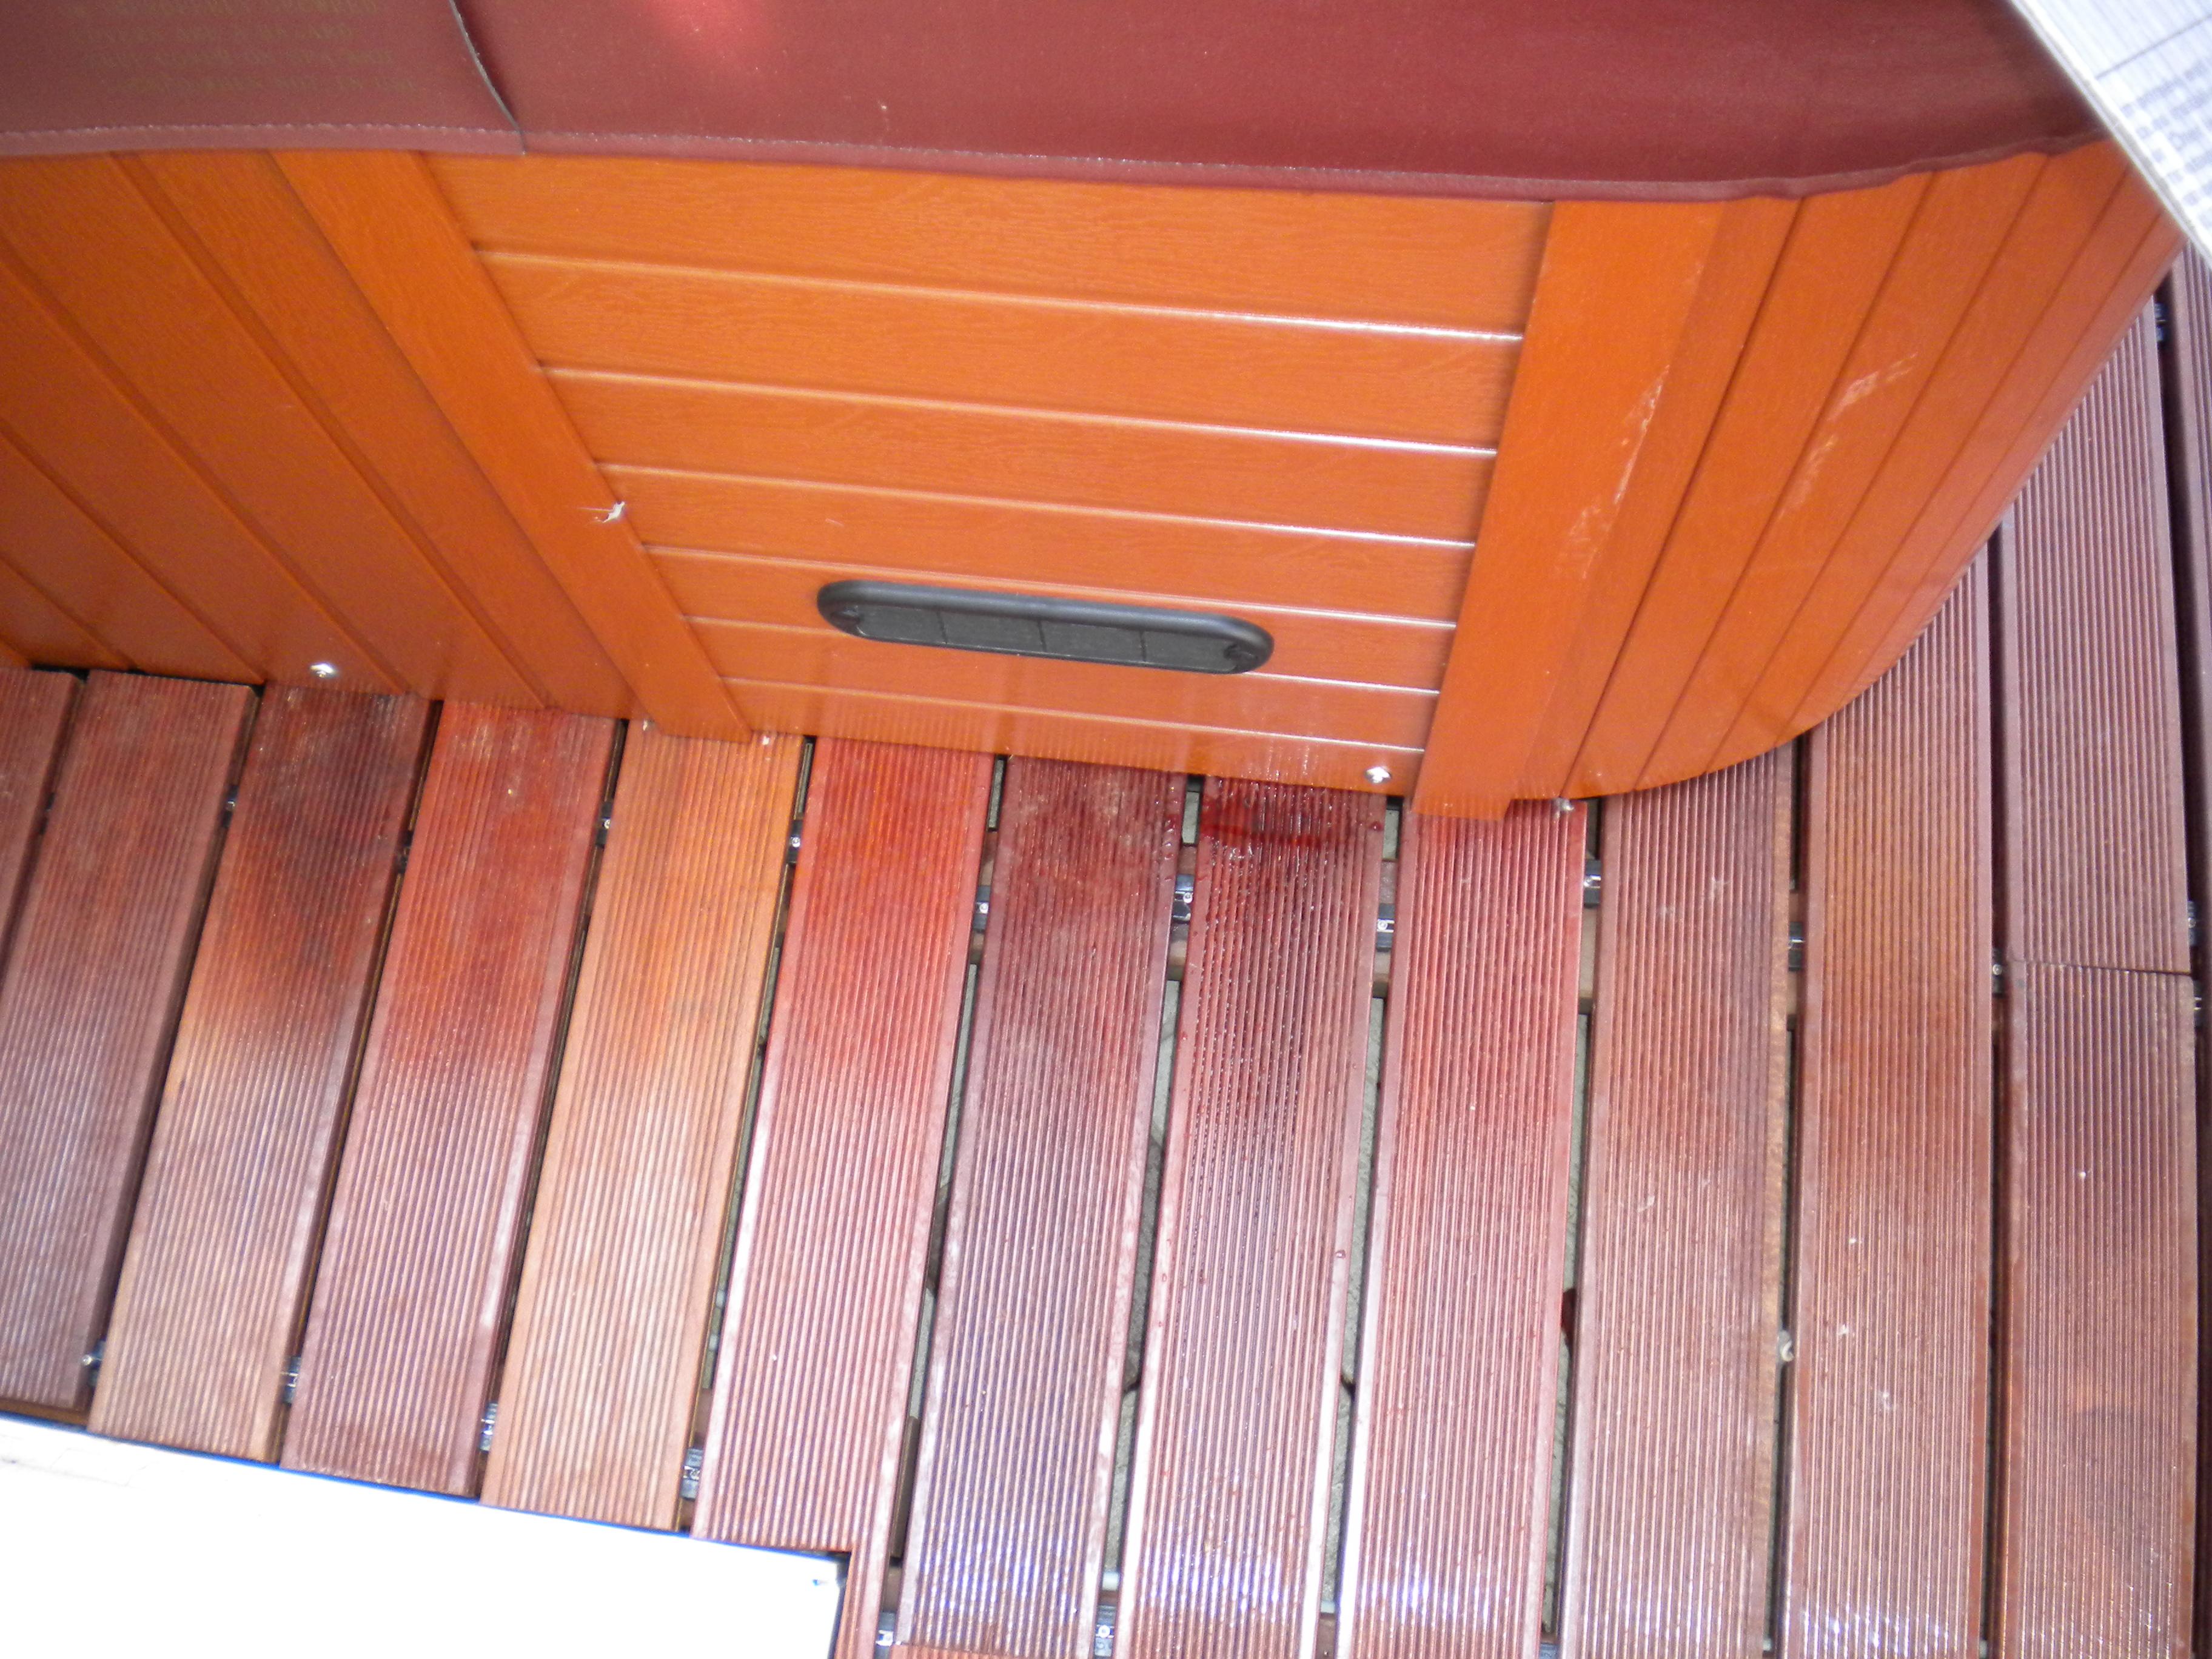 Deck-uri lemn - Massaranduba SELVA FLOORS - Poza 12